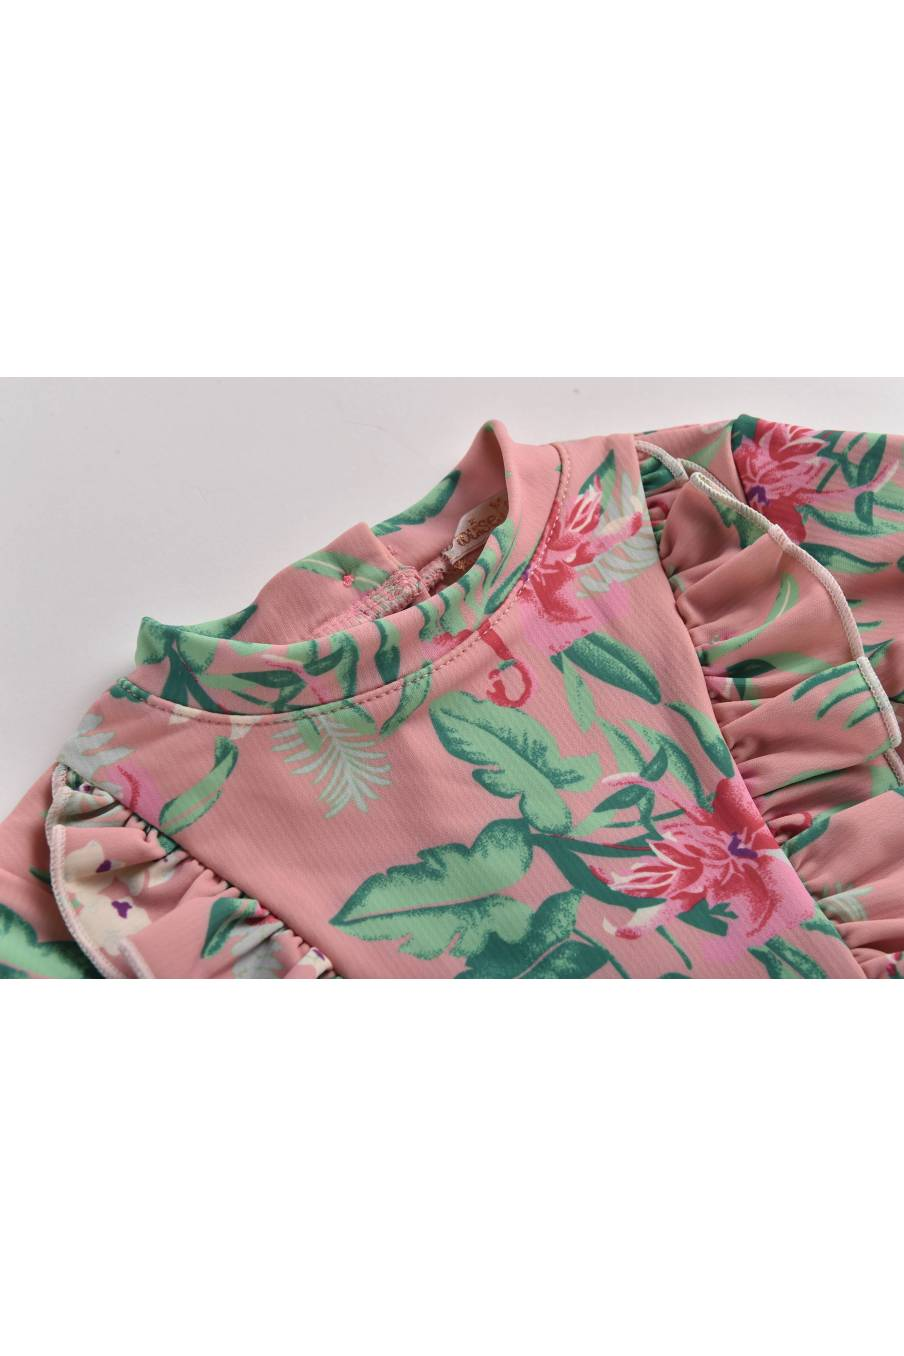 UV Protective Set Toluca Sienna Flamingo